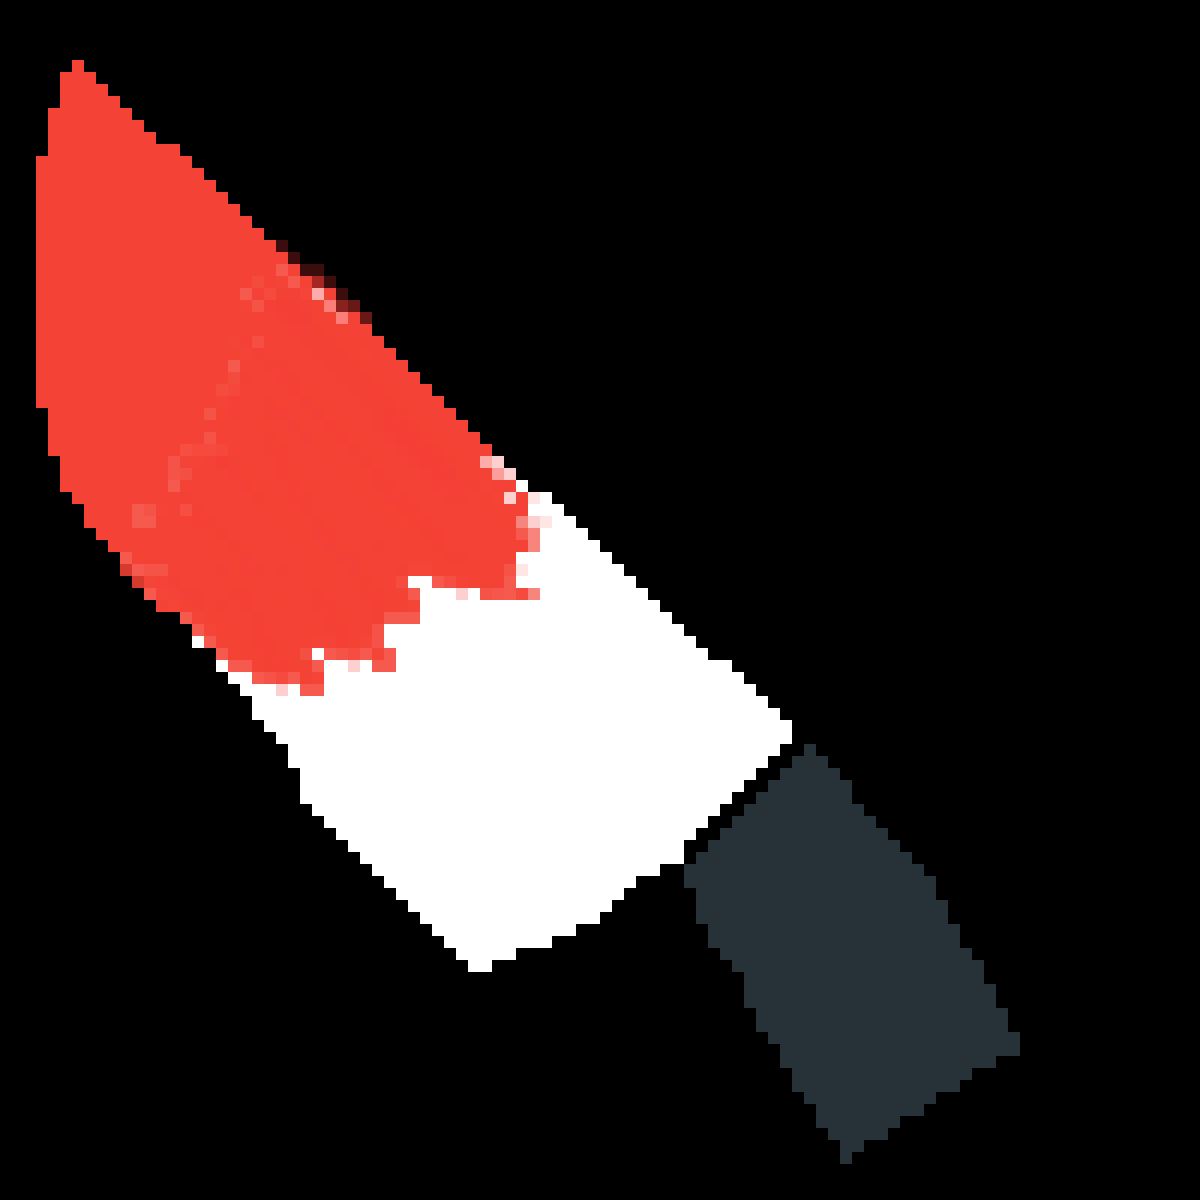 Chara's Knife by FloweytheTEM